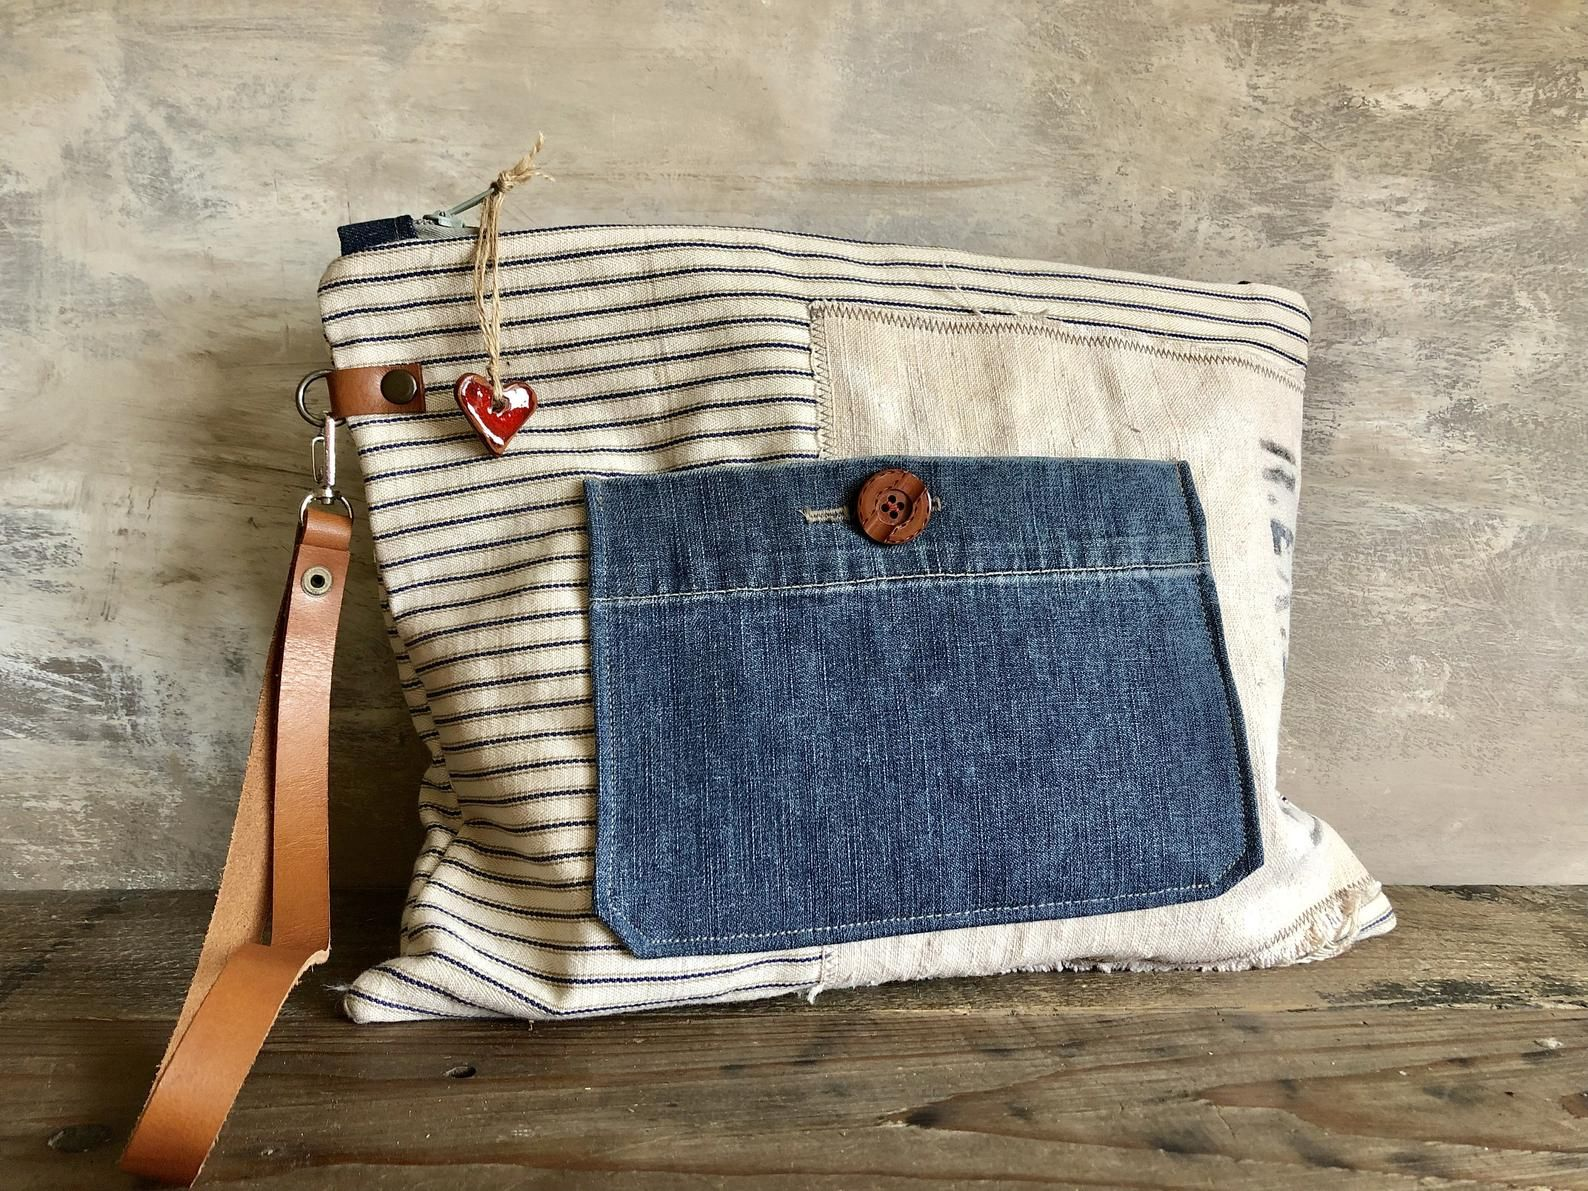 Huge Boho Clutch. Linen,leather, denim and cotton Clutch